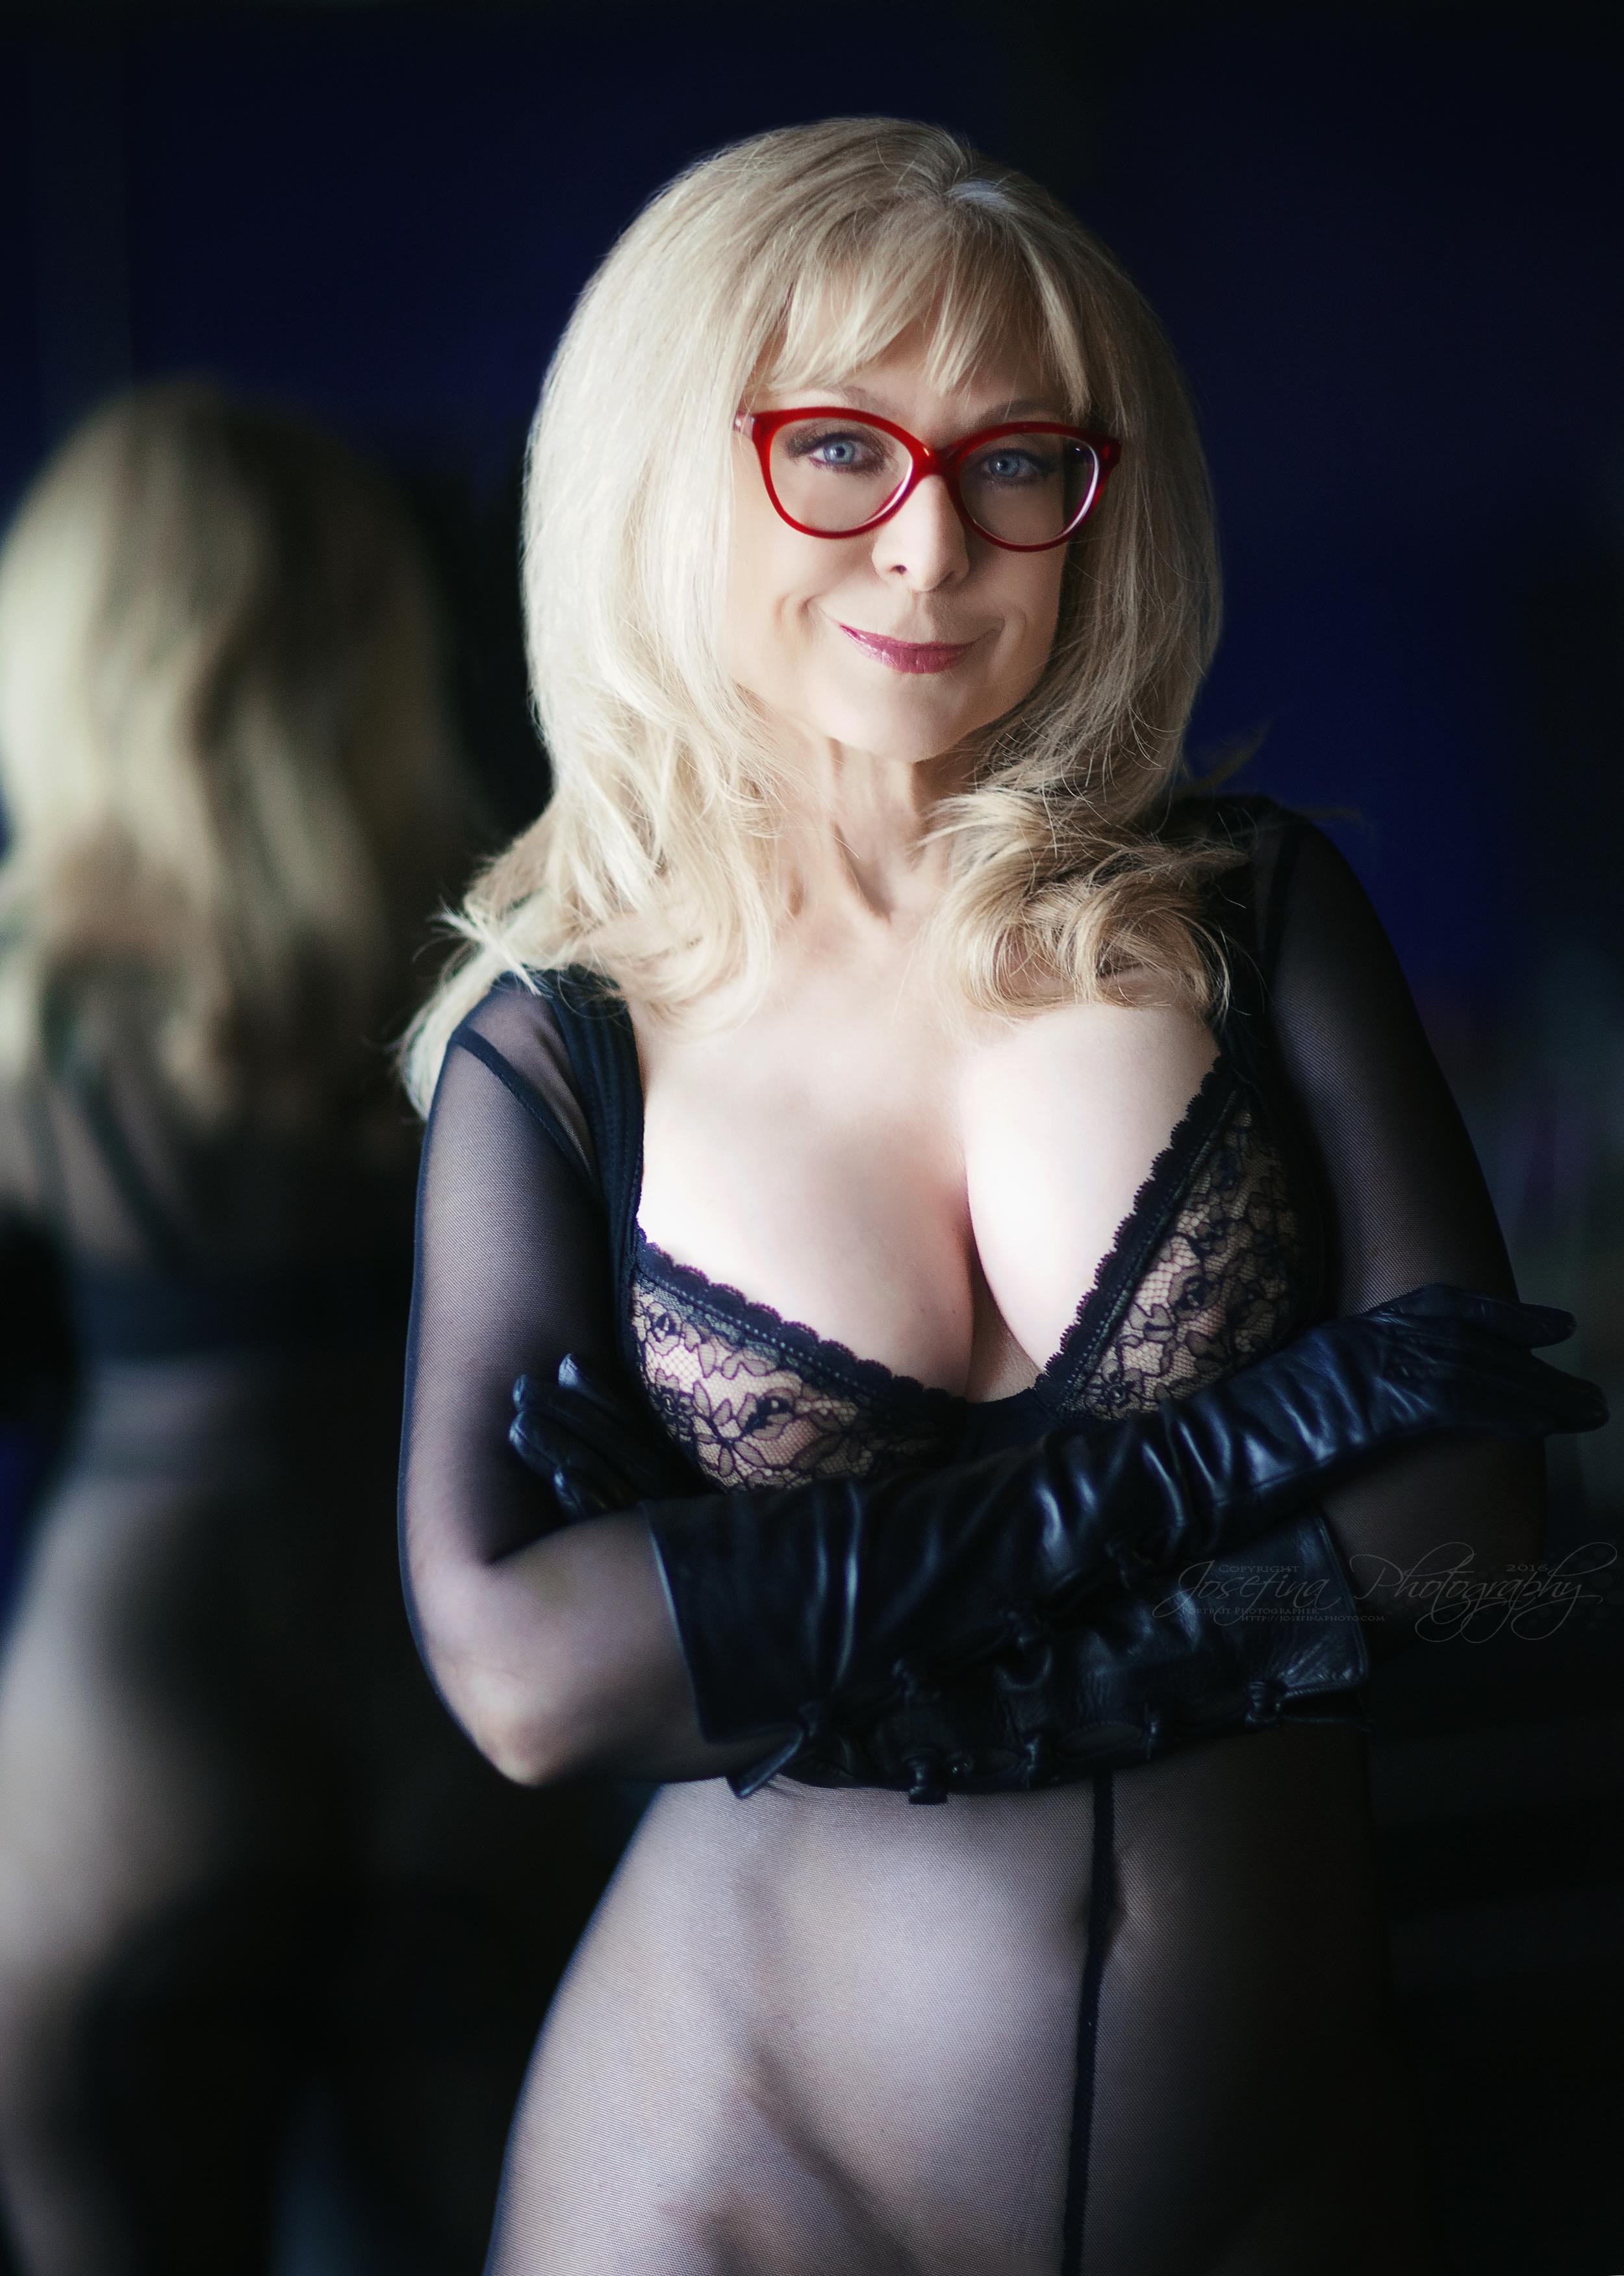 Color Version | M: Nina Hartley | Glasses: Cutler & Gross | Bodysuit: WinterFetish.com | Bra: Wolford Fashion | Gloves: Bergdorfs | Copyright © Josefina Photography 2016